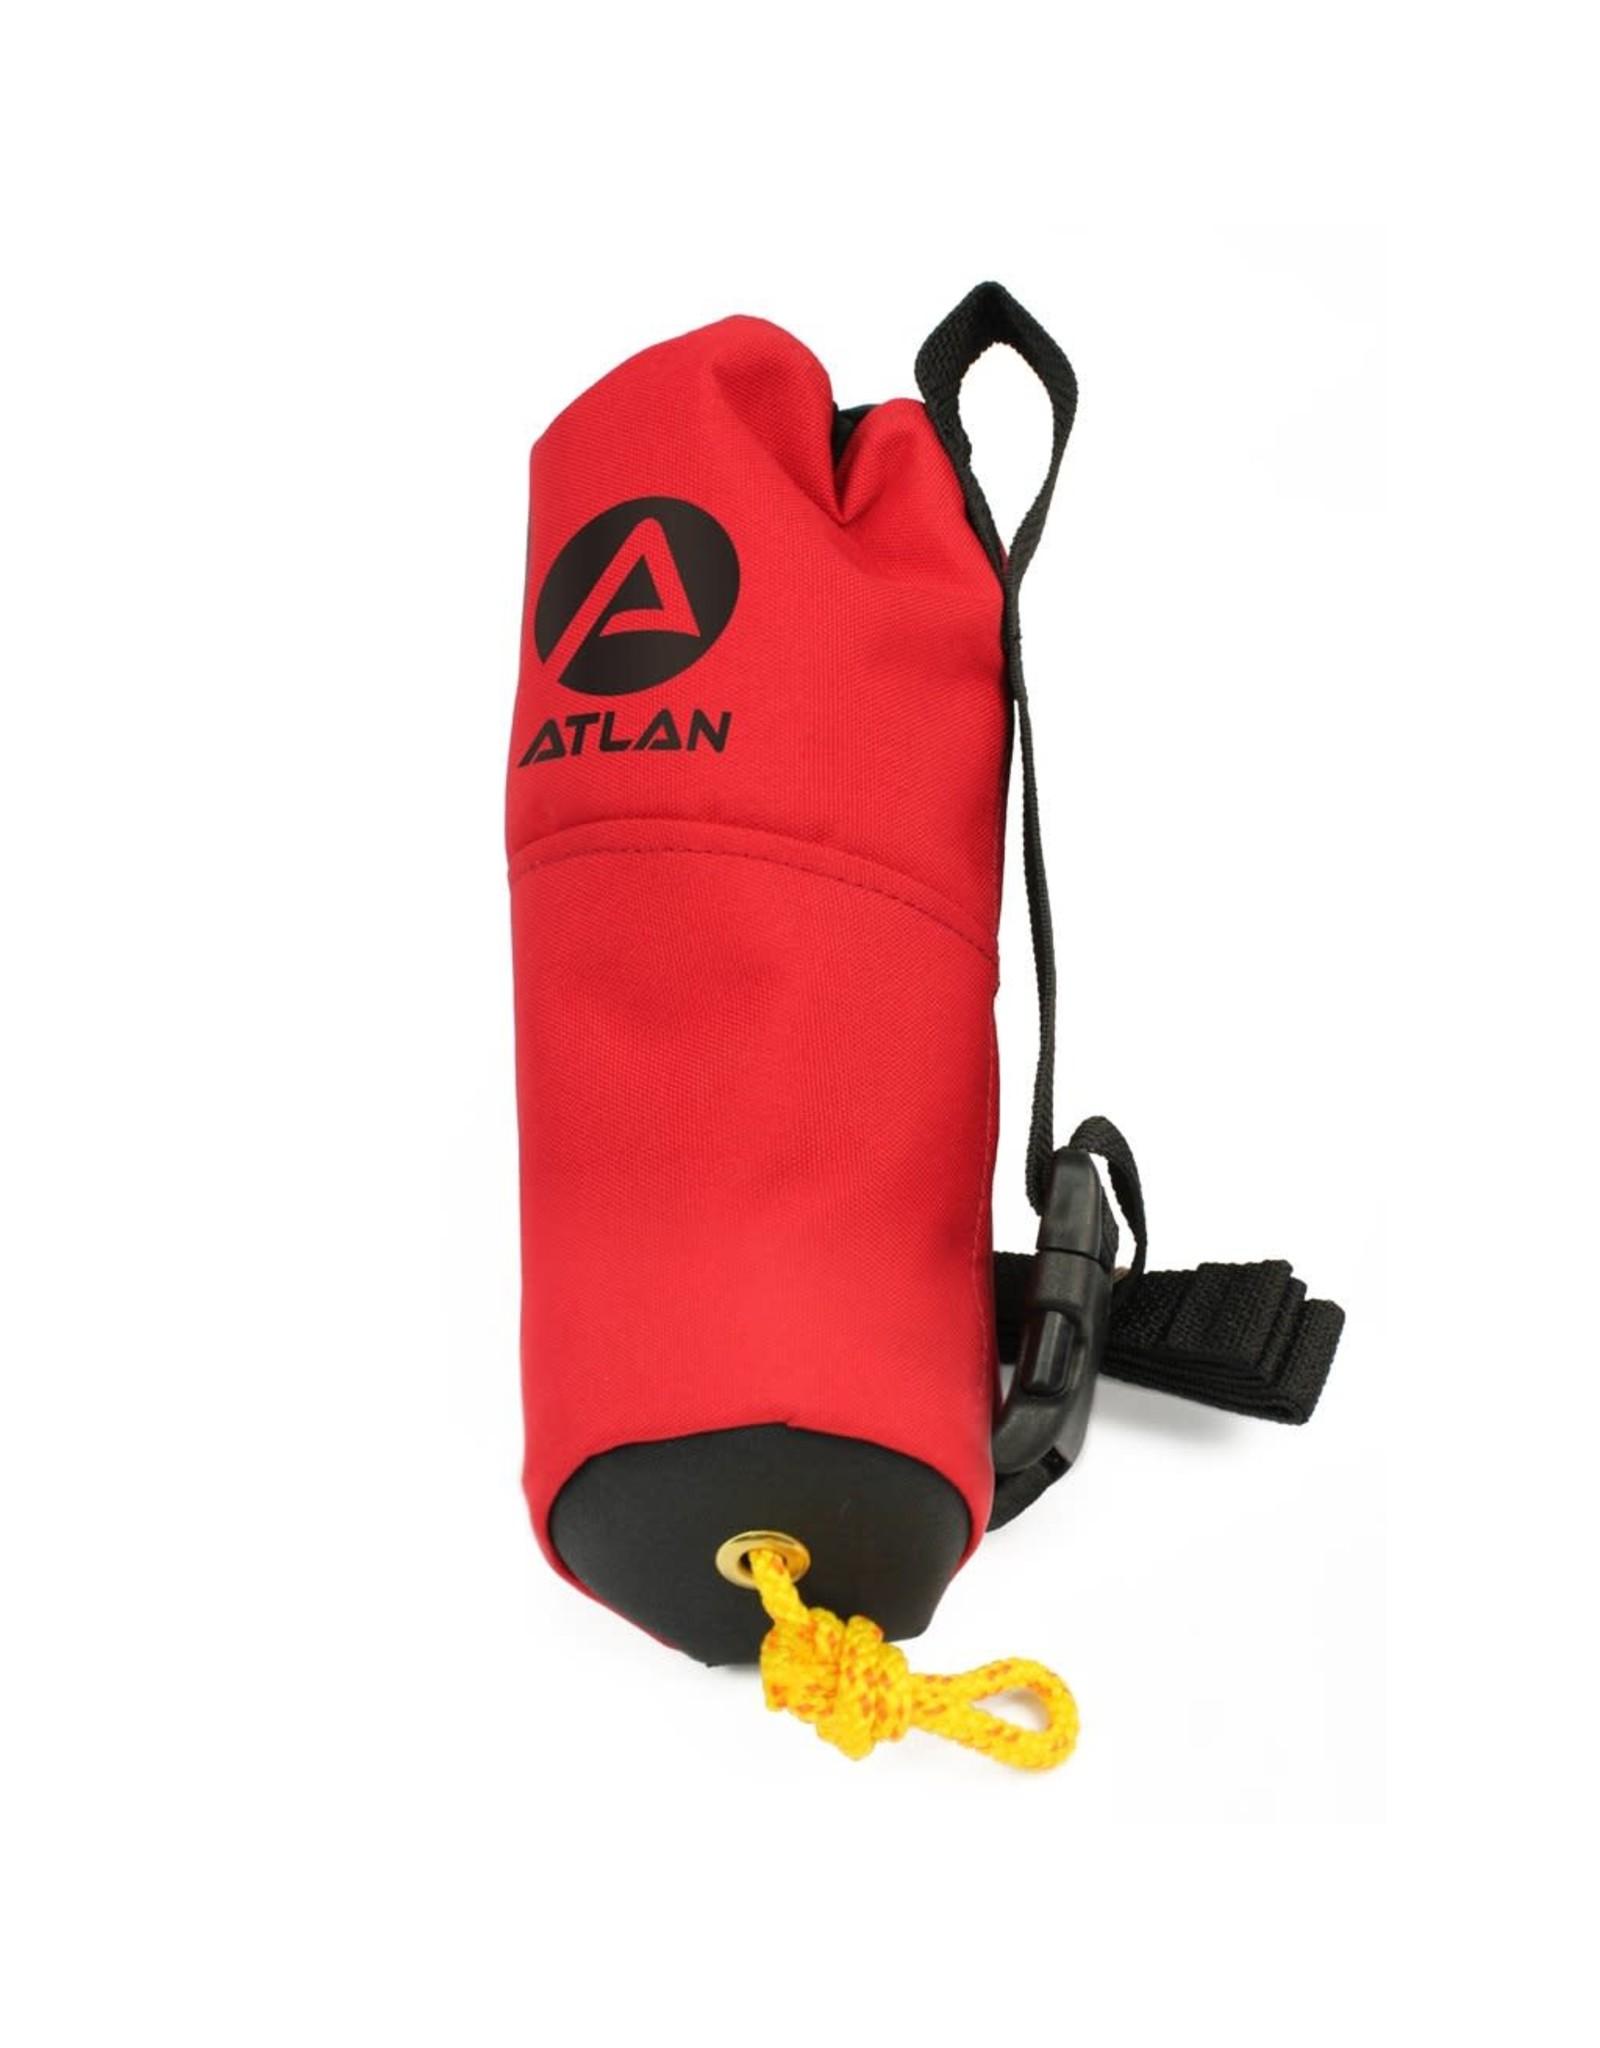 Atlan Atlan Sac à corde 6,4 mm, 50 pieds à tressage simple